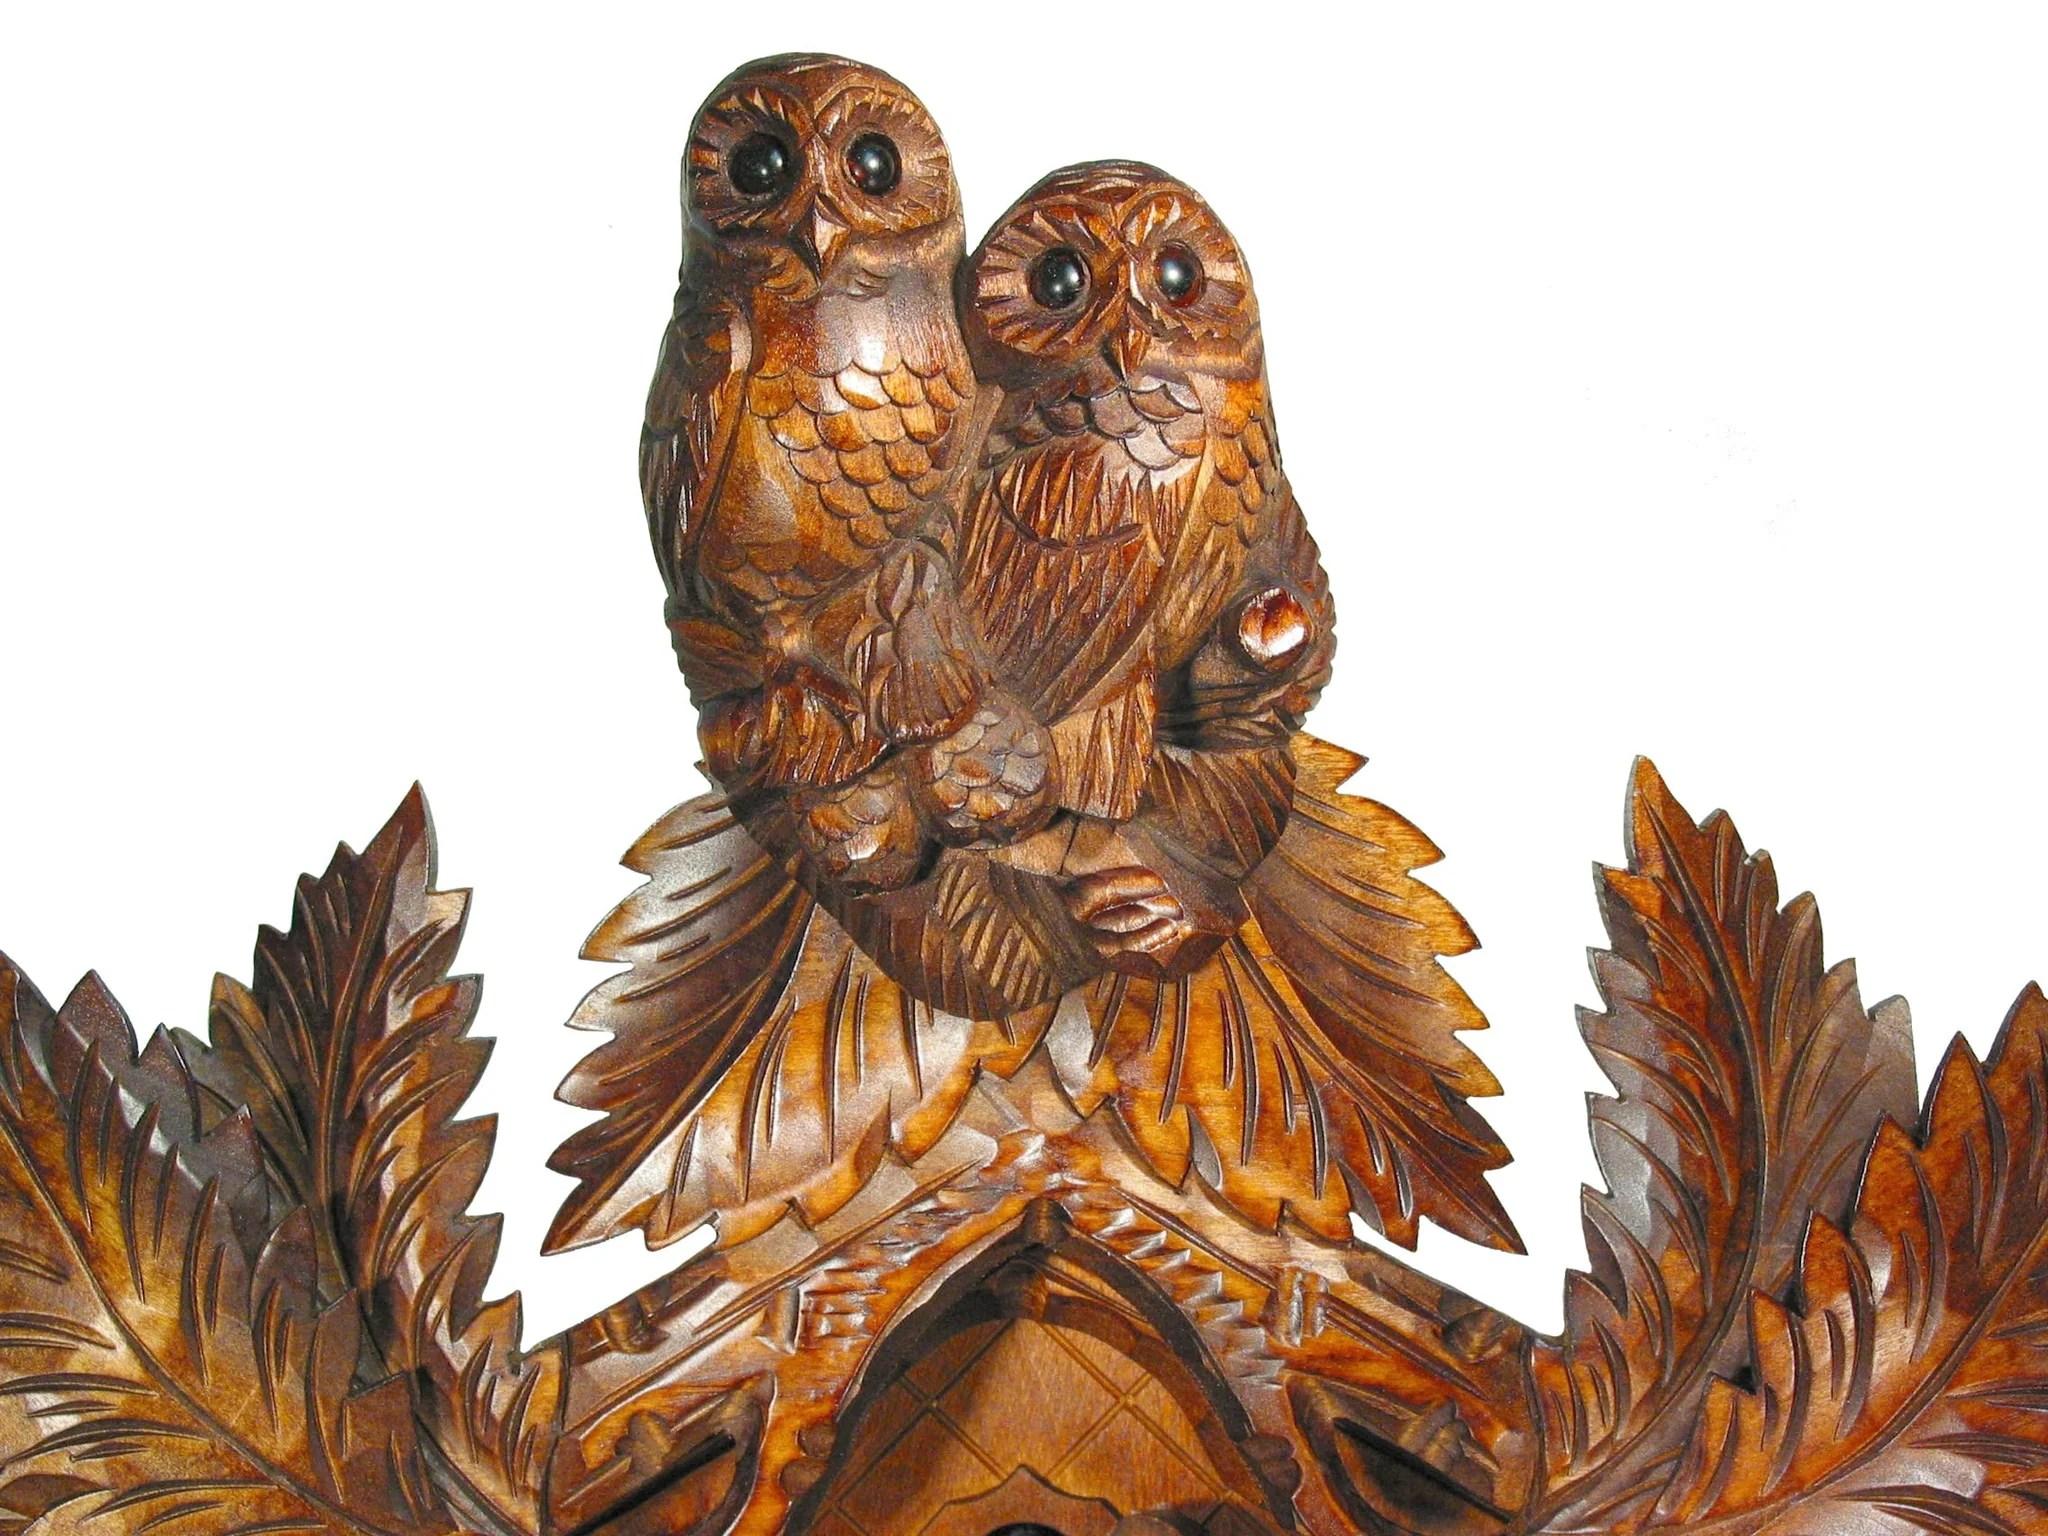 Carved 8-day Owl Cuckoo Clock 54cm August Schwer